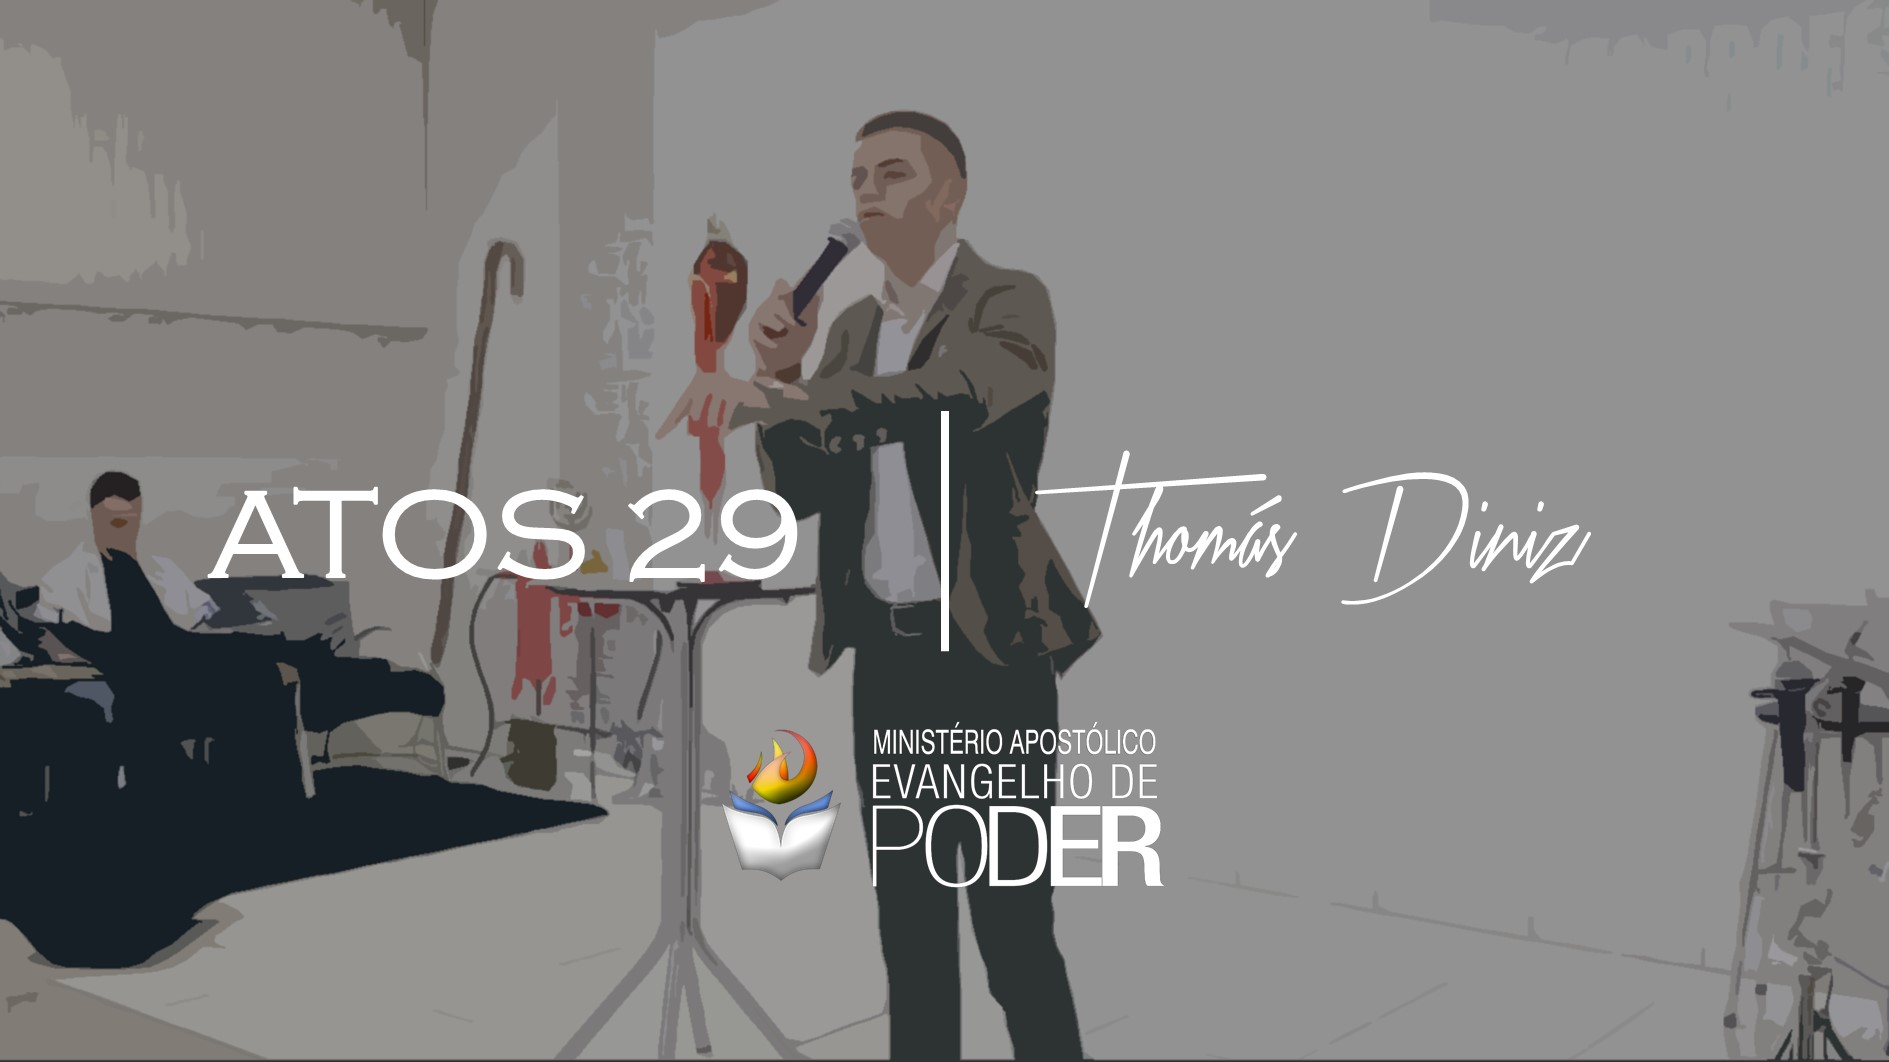 ATOS 29 - THOMÁS DINIZ